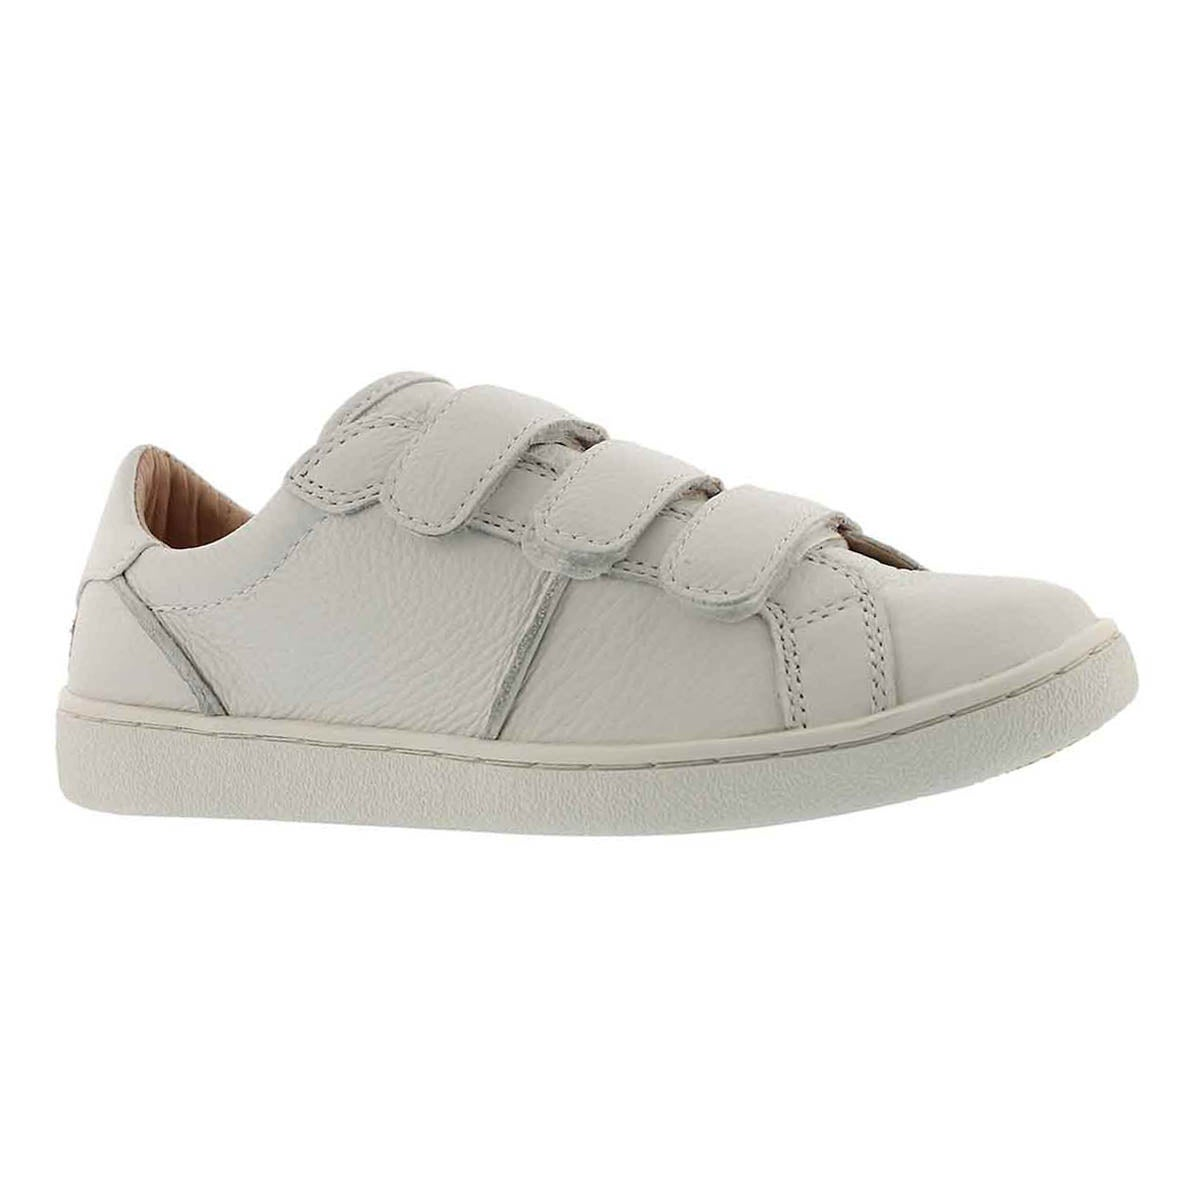 Women's ALIX white hook & loop casual sneaker